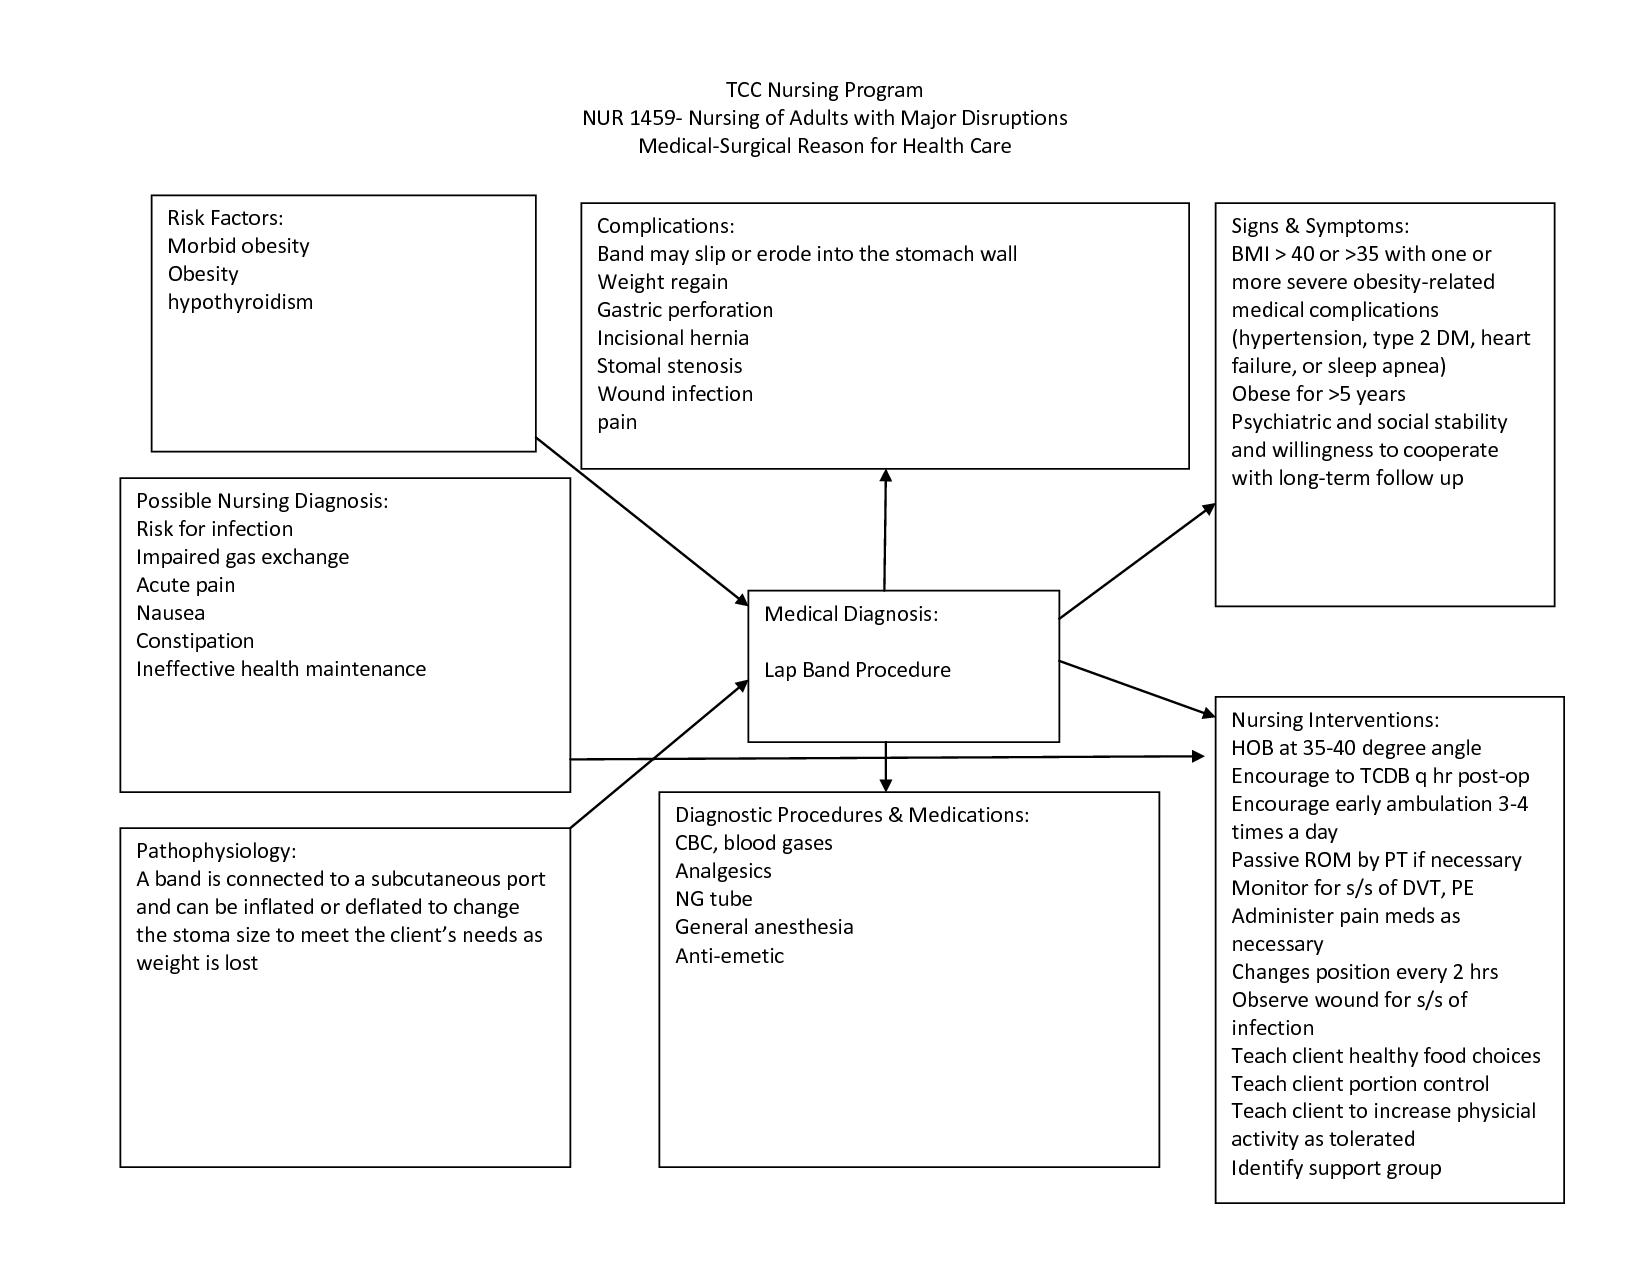 Nursing Diagnosis Concept Maps scope of work template